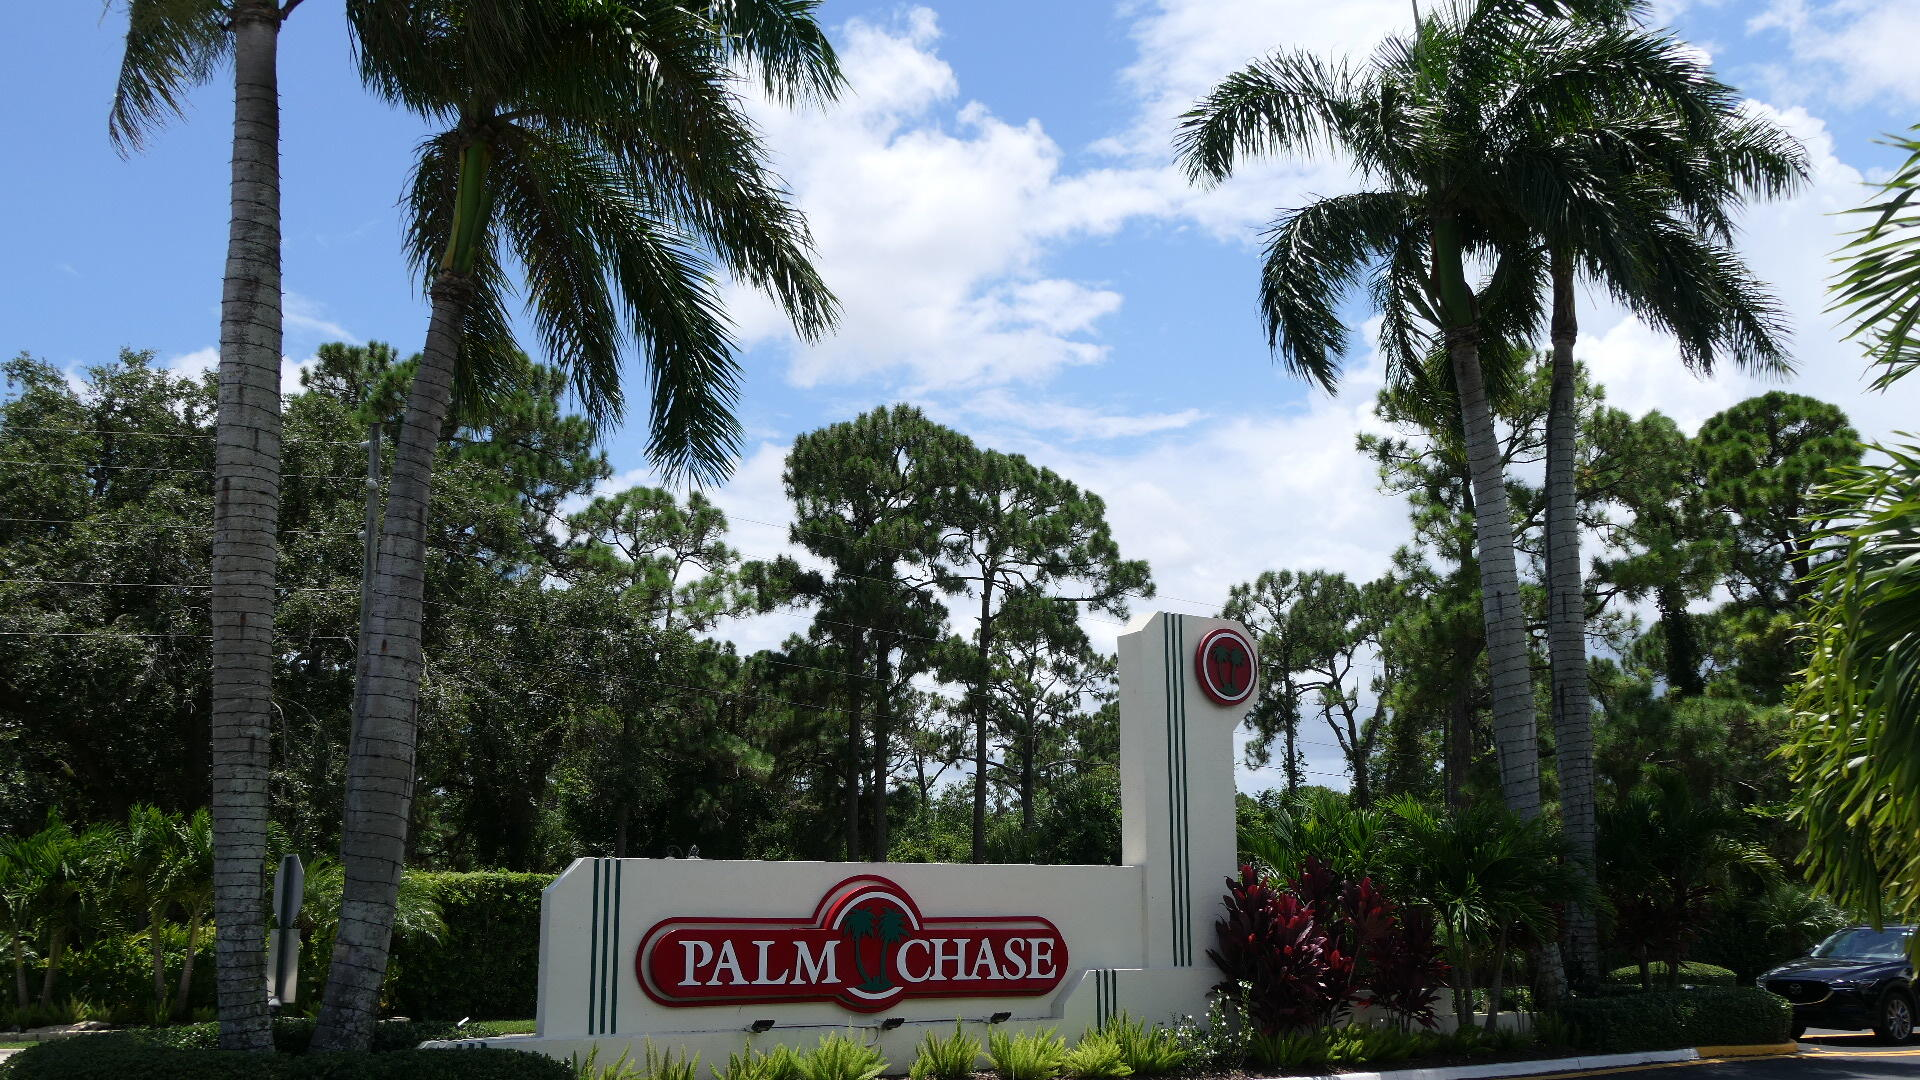 10804 Bahama Palm Way 101 Boynton Beach, FL 33437 photo 48